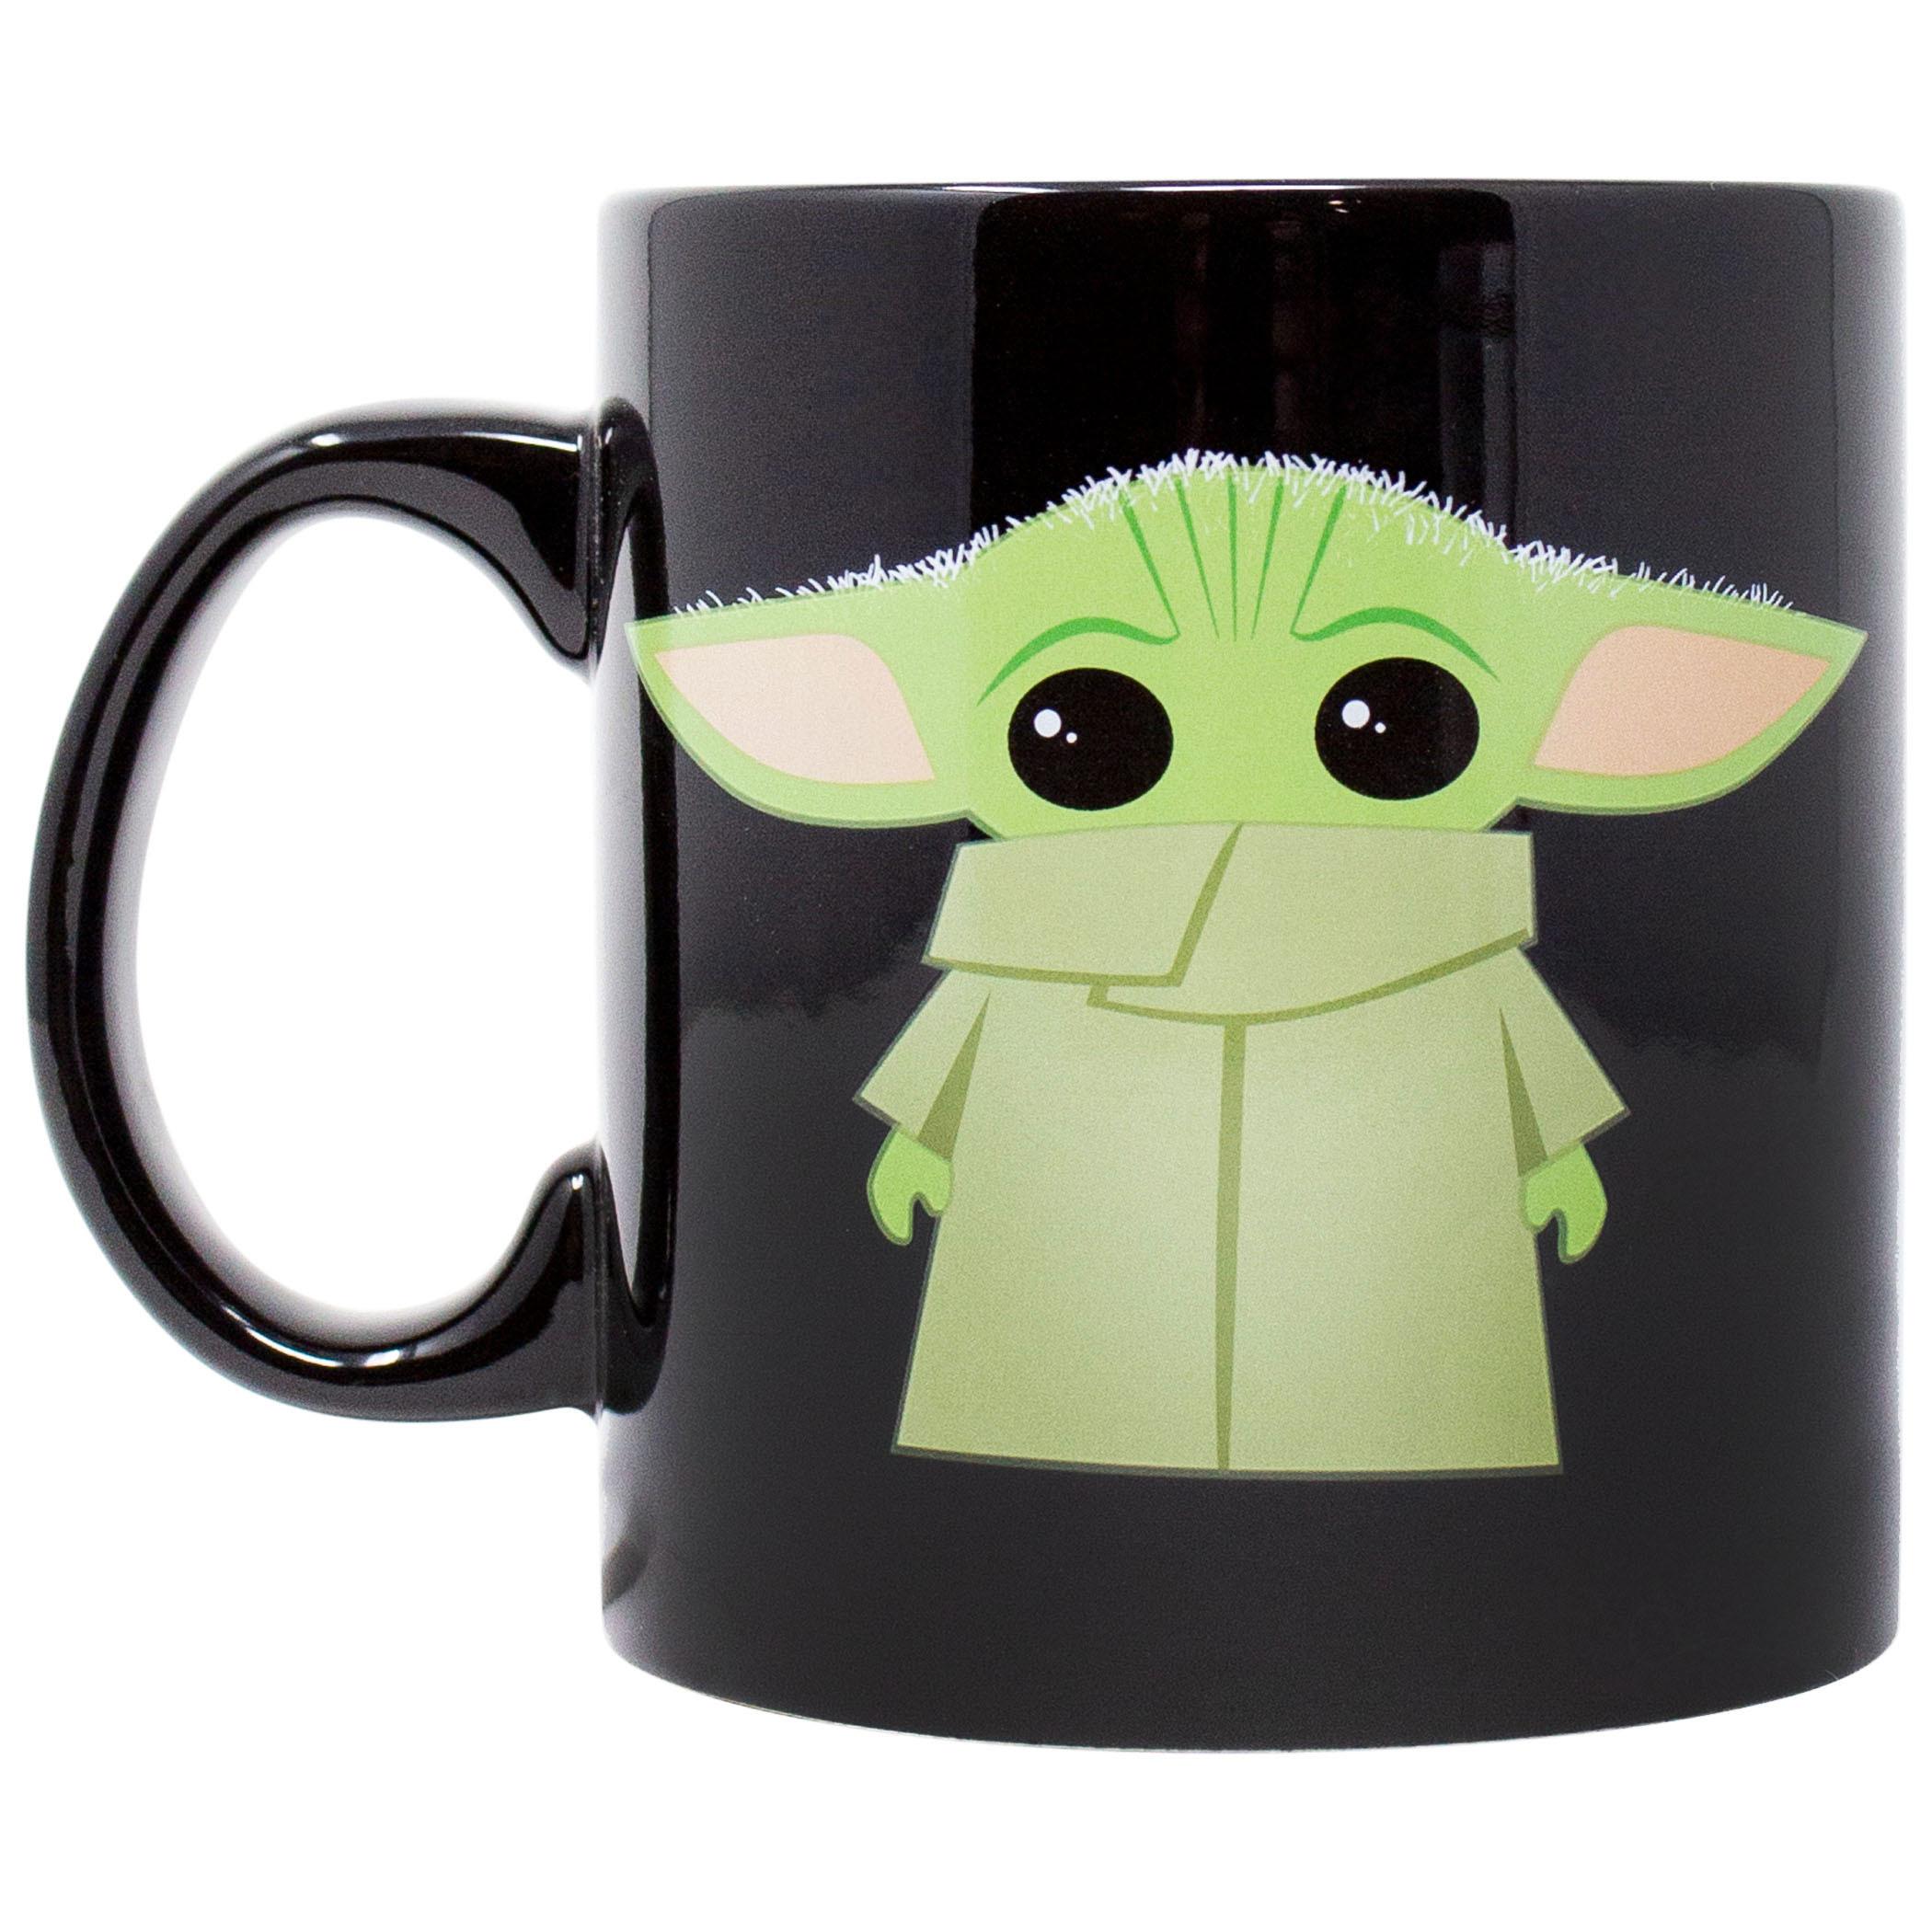 "Star Wars The Mandalorian ""The Child"" 20oz Ceramic Mug"